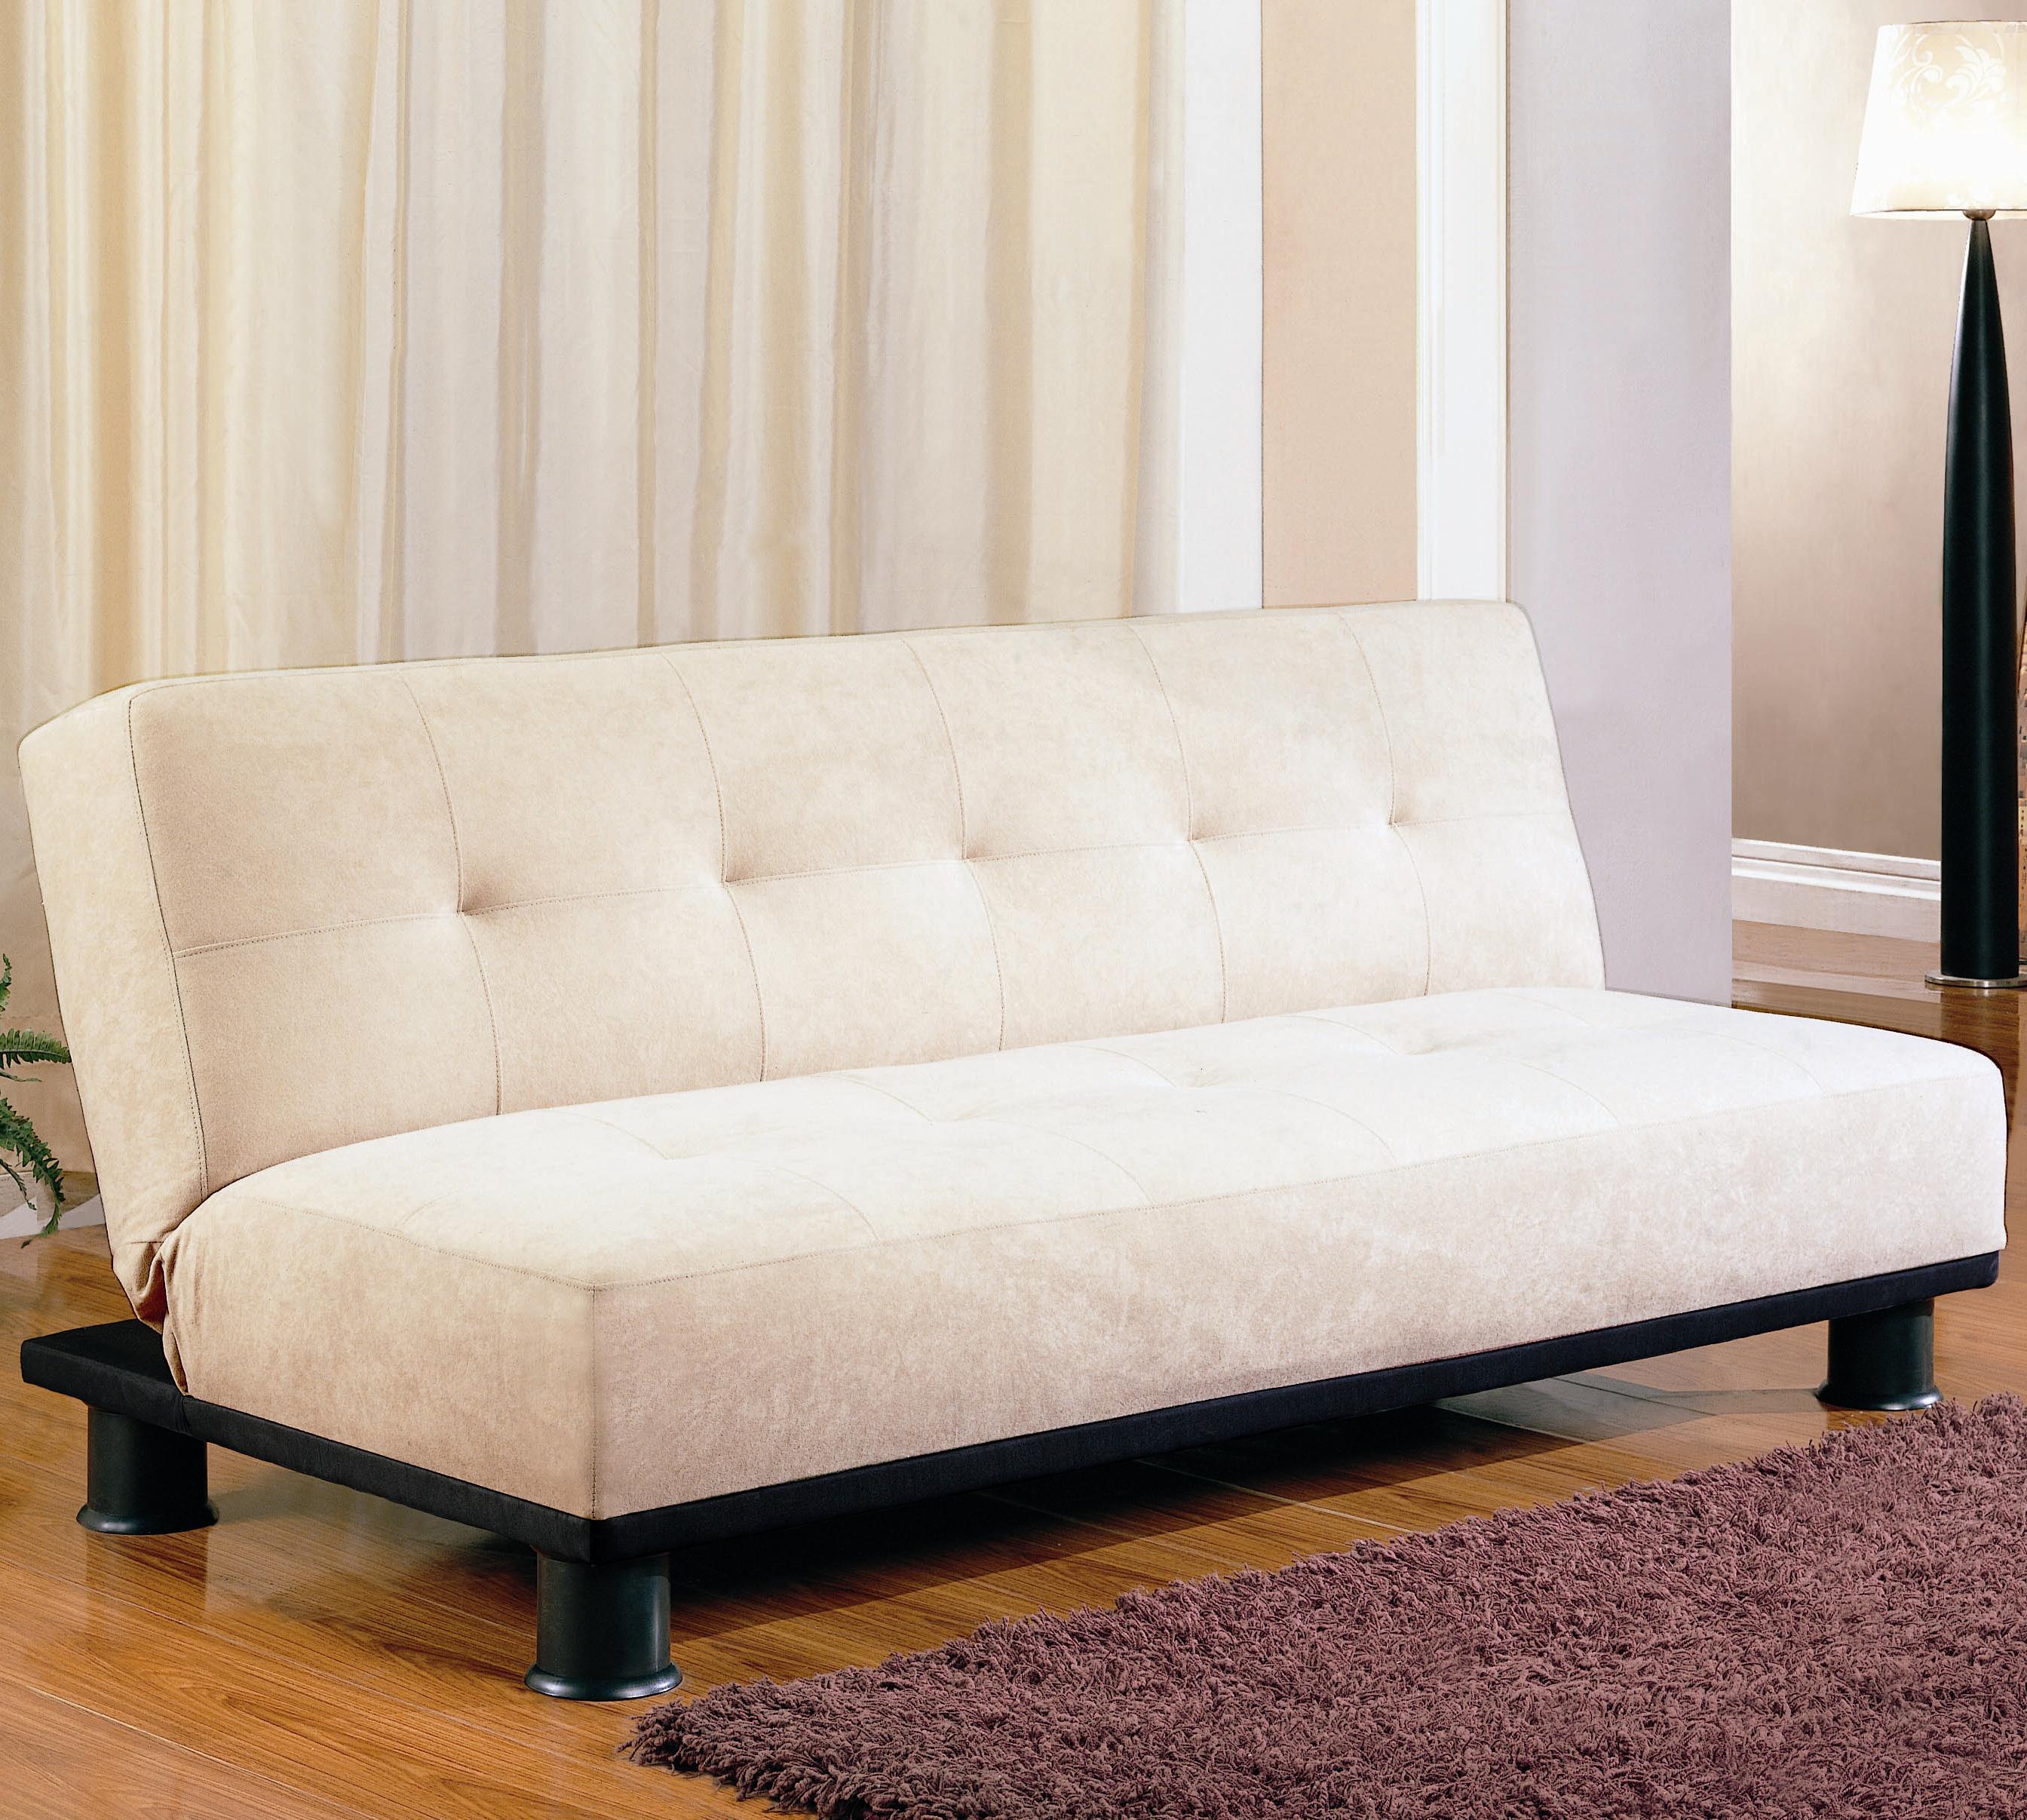 Contemporary Futon Sofa Bed: Fine Furniture Sofa Beds And Futons 300163 Contemporary